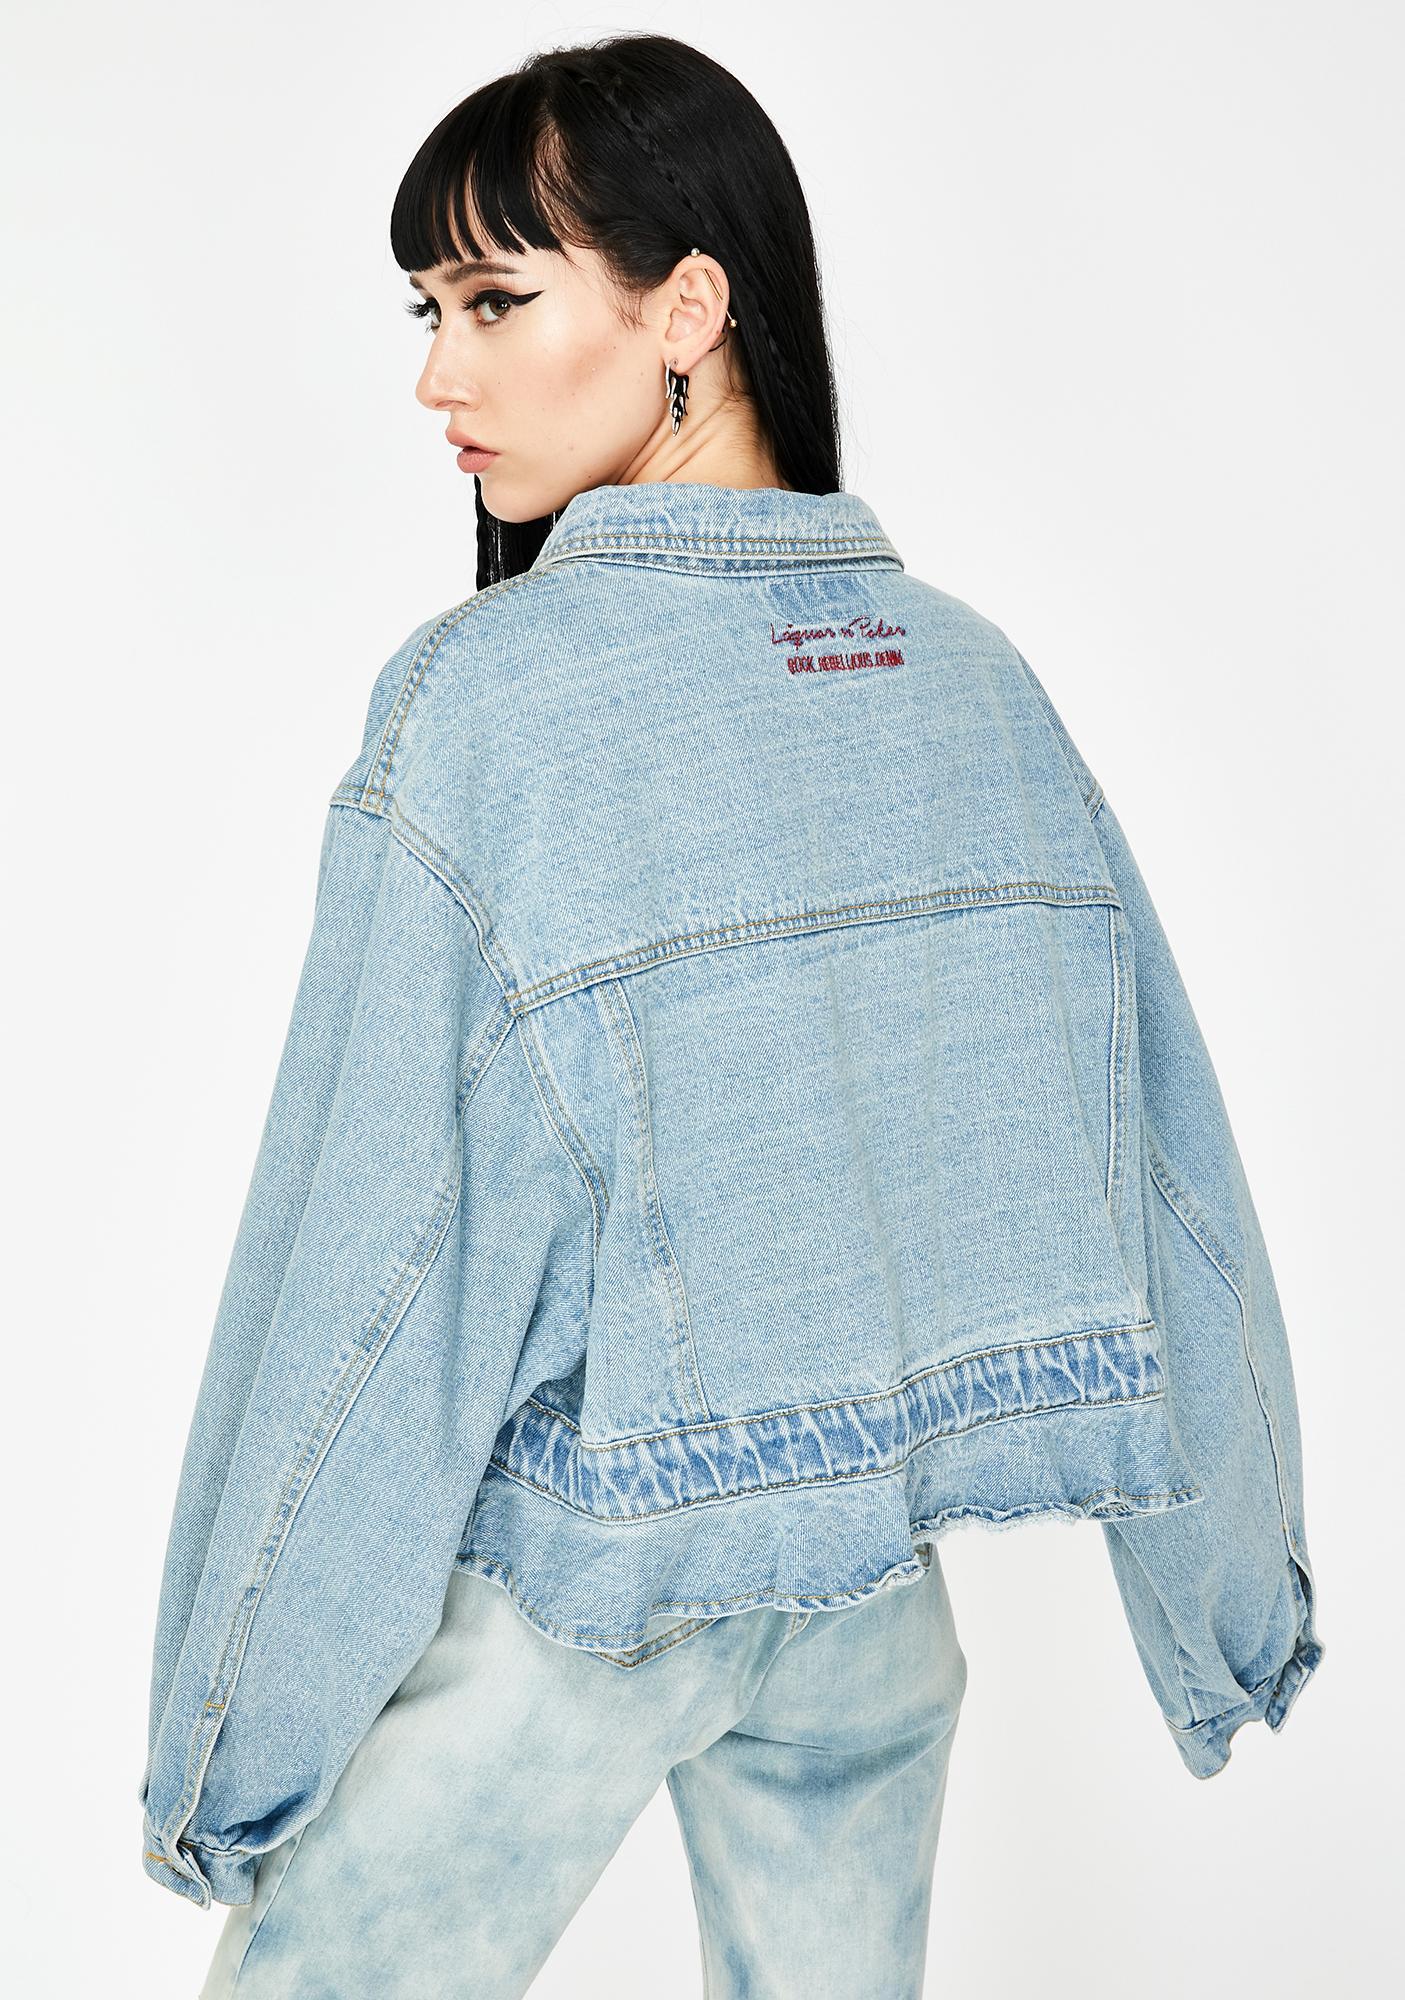 Liquor N Poker Dakota Oversized Cropped Denim Jacket